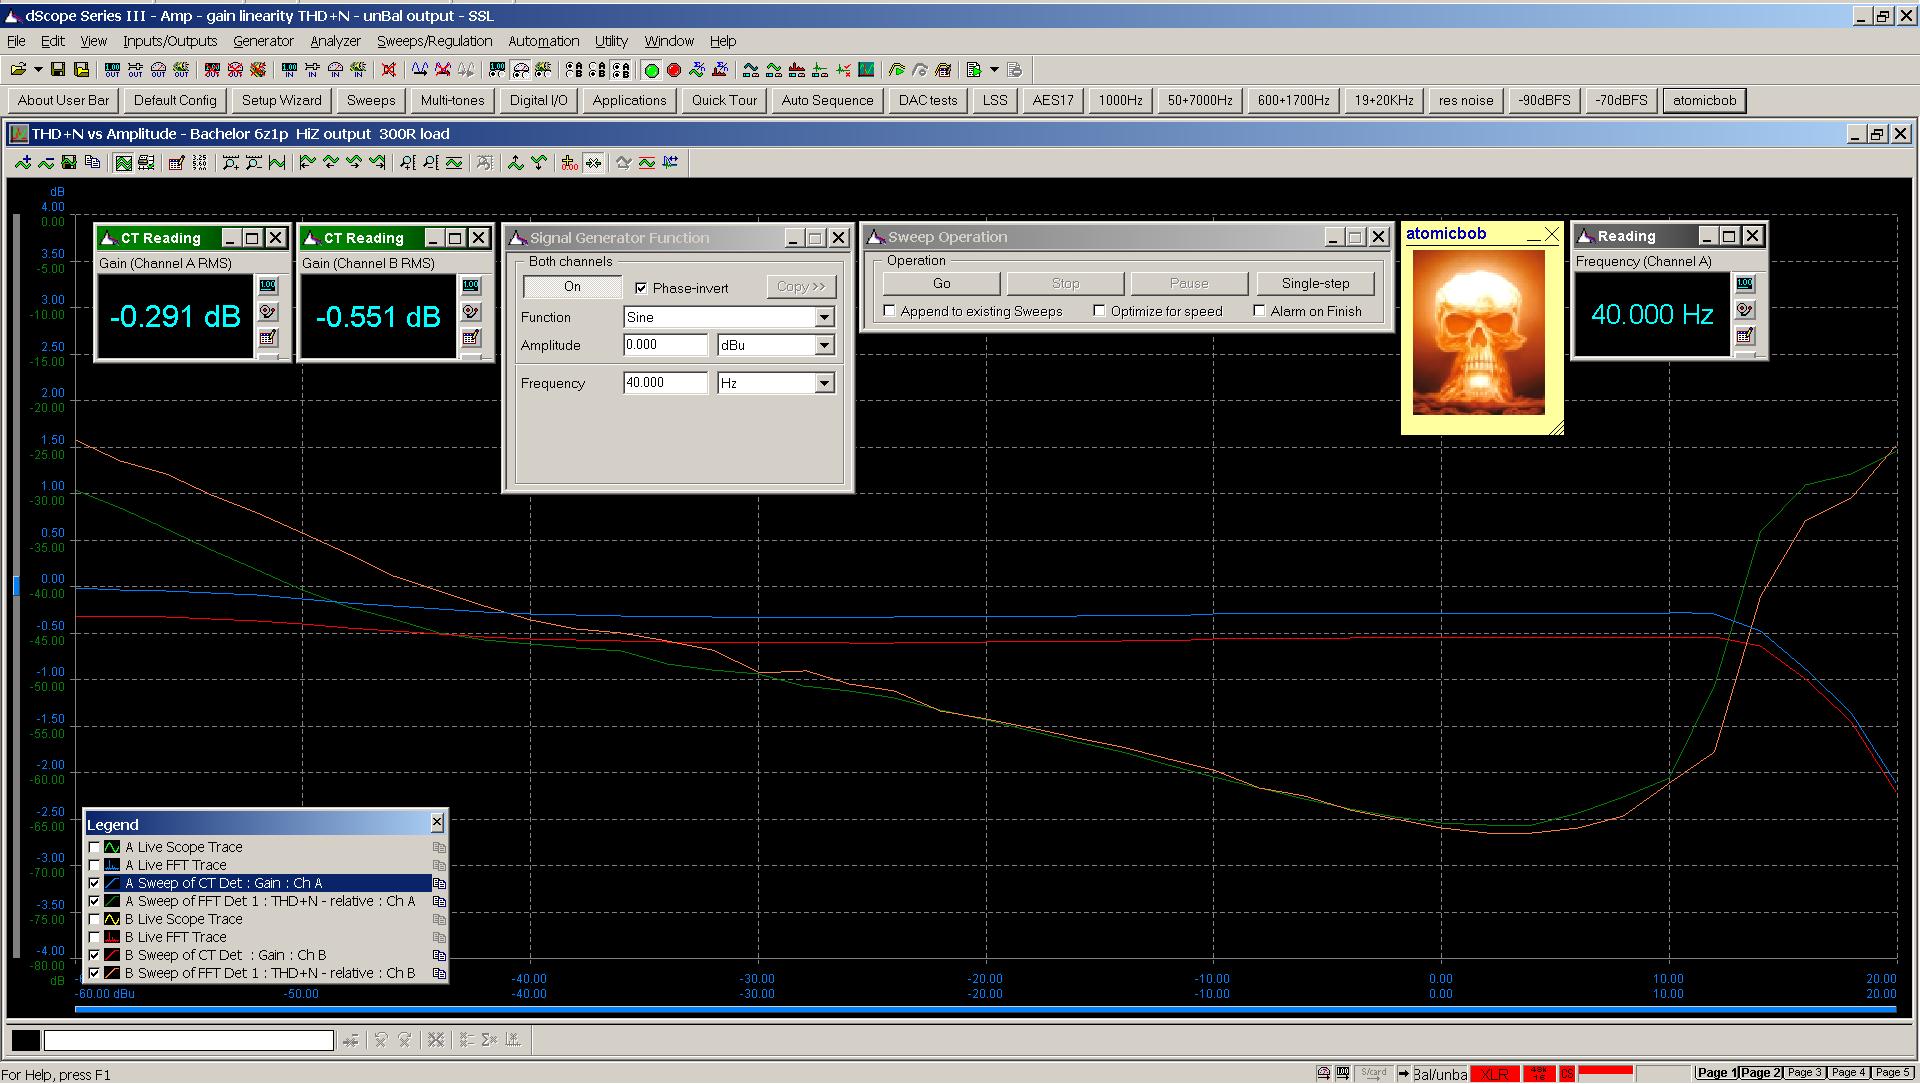 04 20200622 Bachelor 6z1p 40Hz gain linearity THD+N sweep 300R HiZ 0dB gain.png